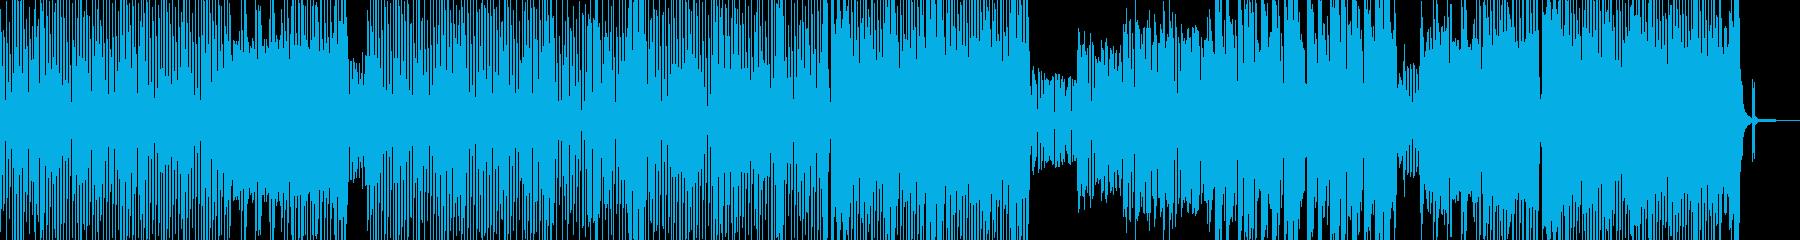 ○oお菓子の国・パステル調ポップo○の再生済みの波形